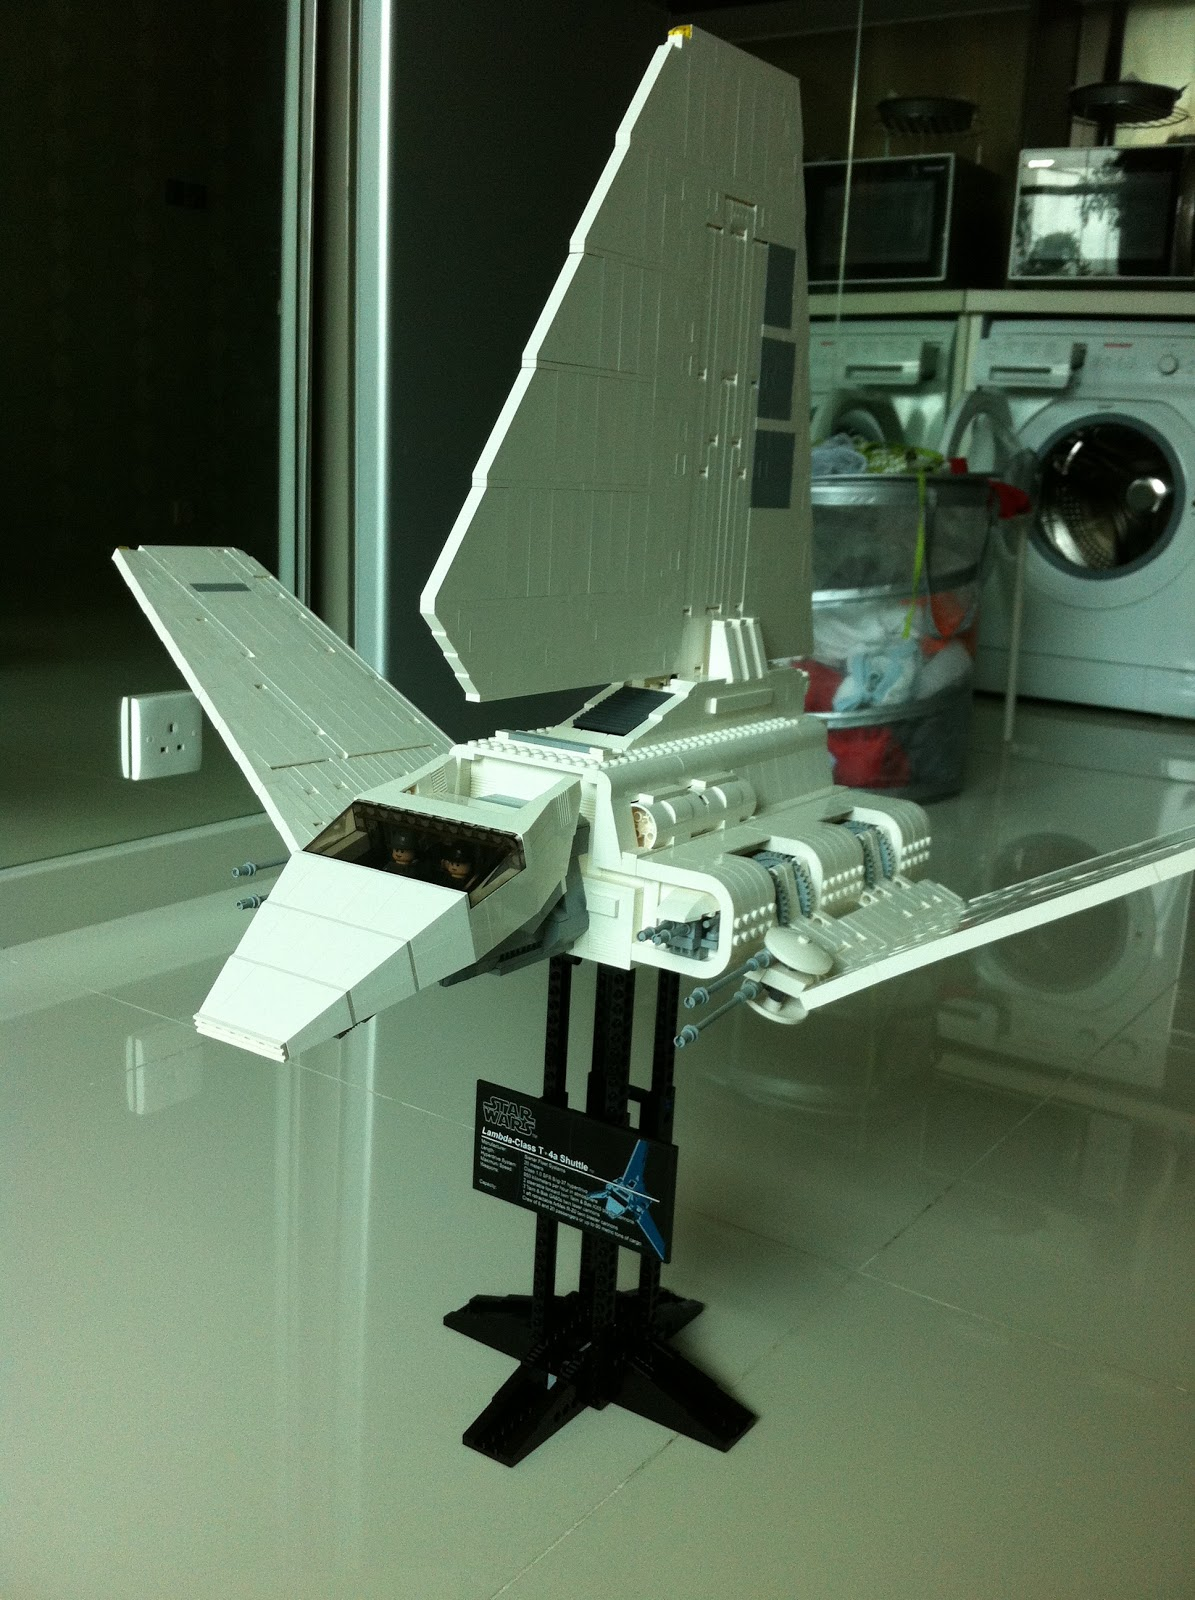 lego ideas ucs space shuttle atlantis - photo #20